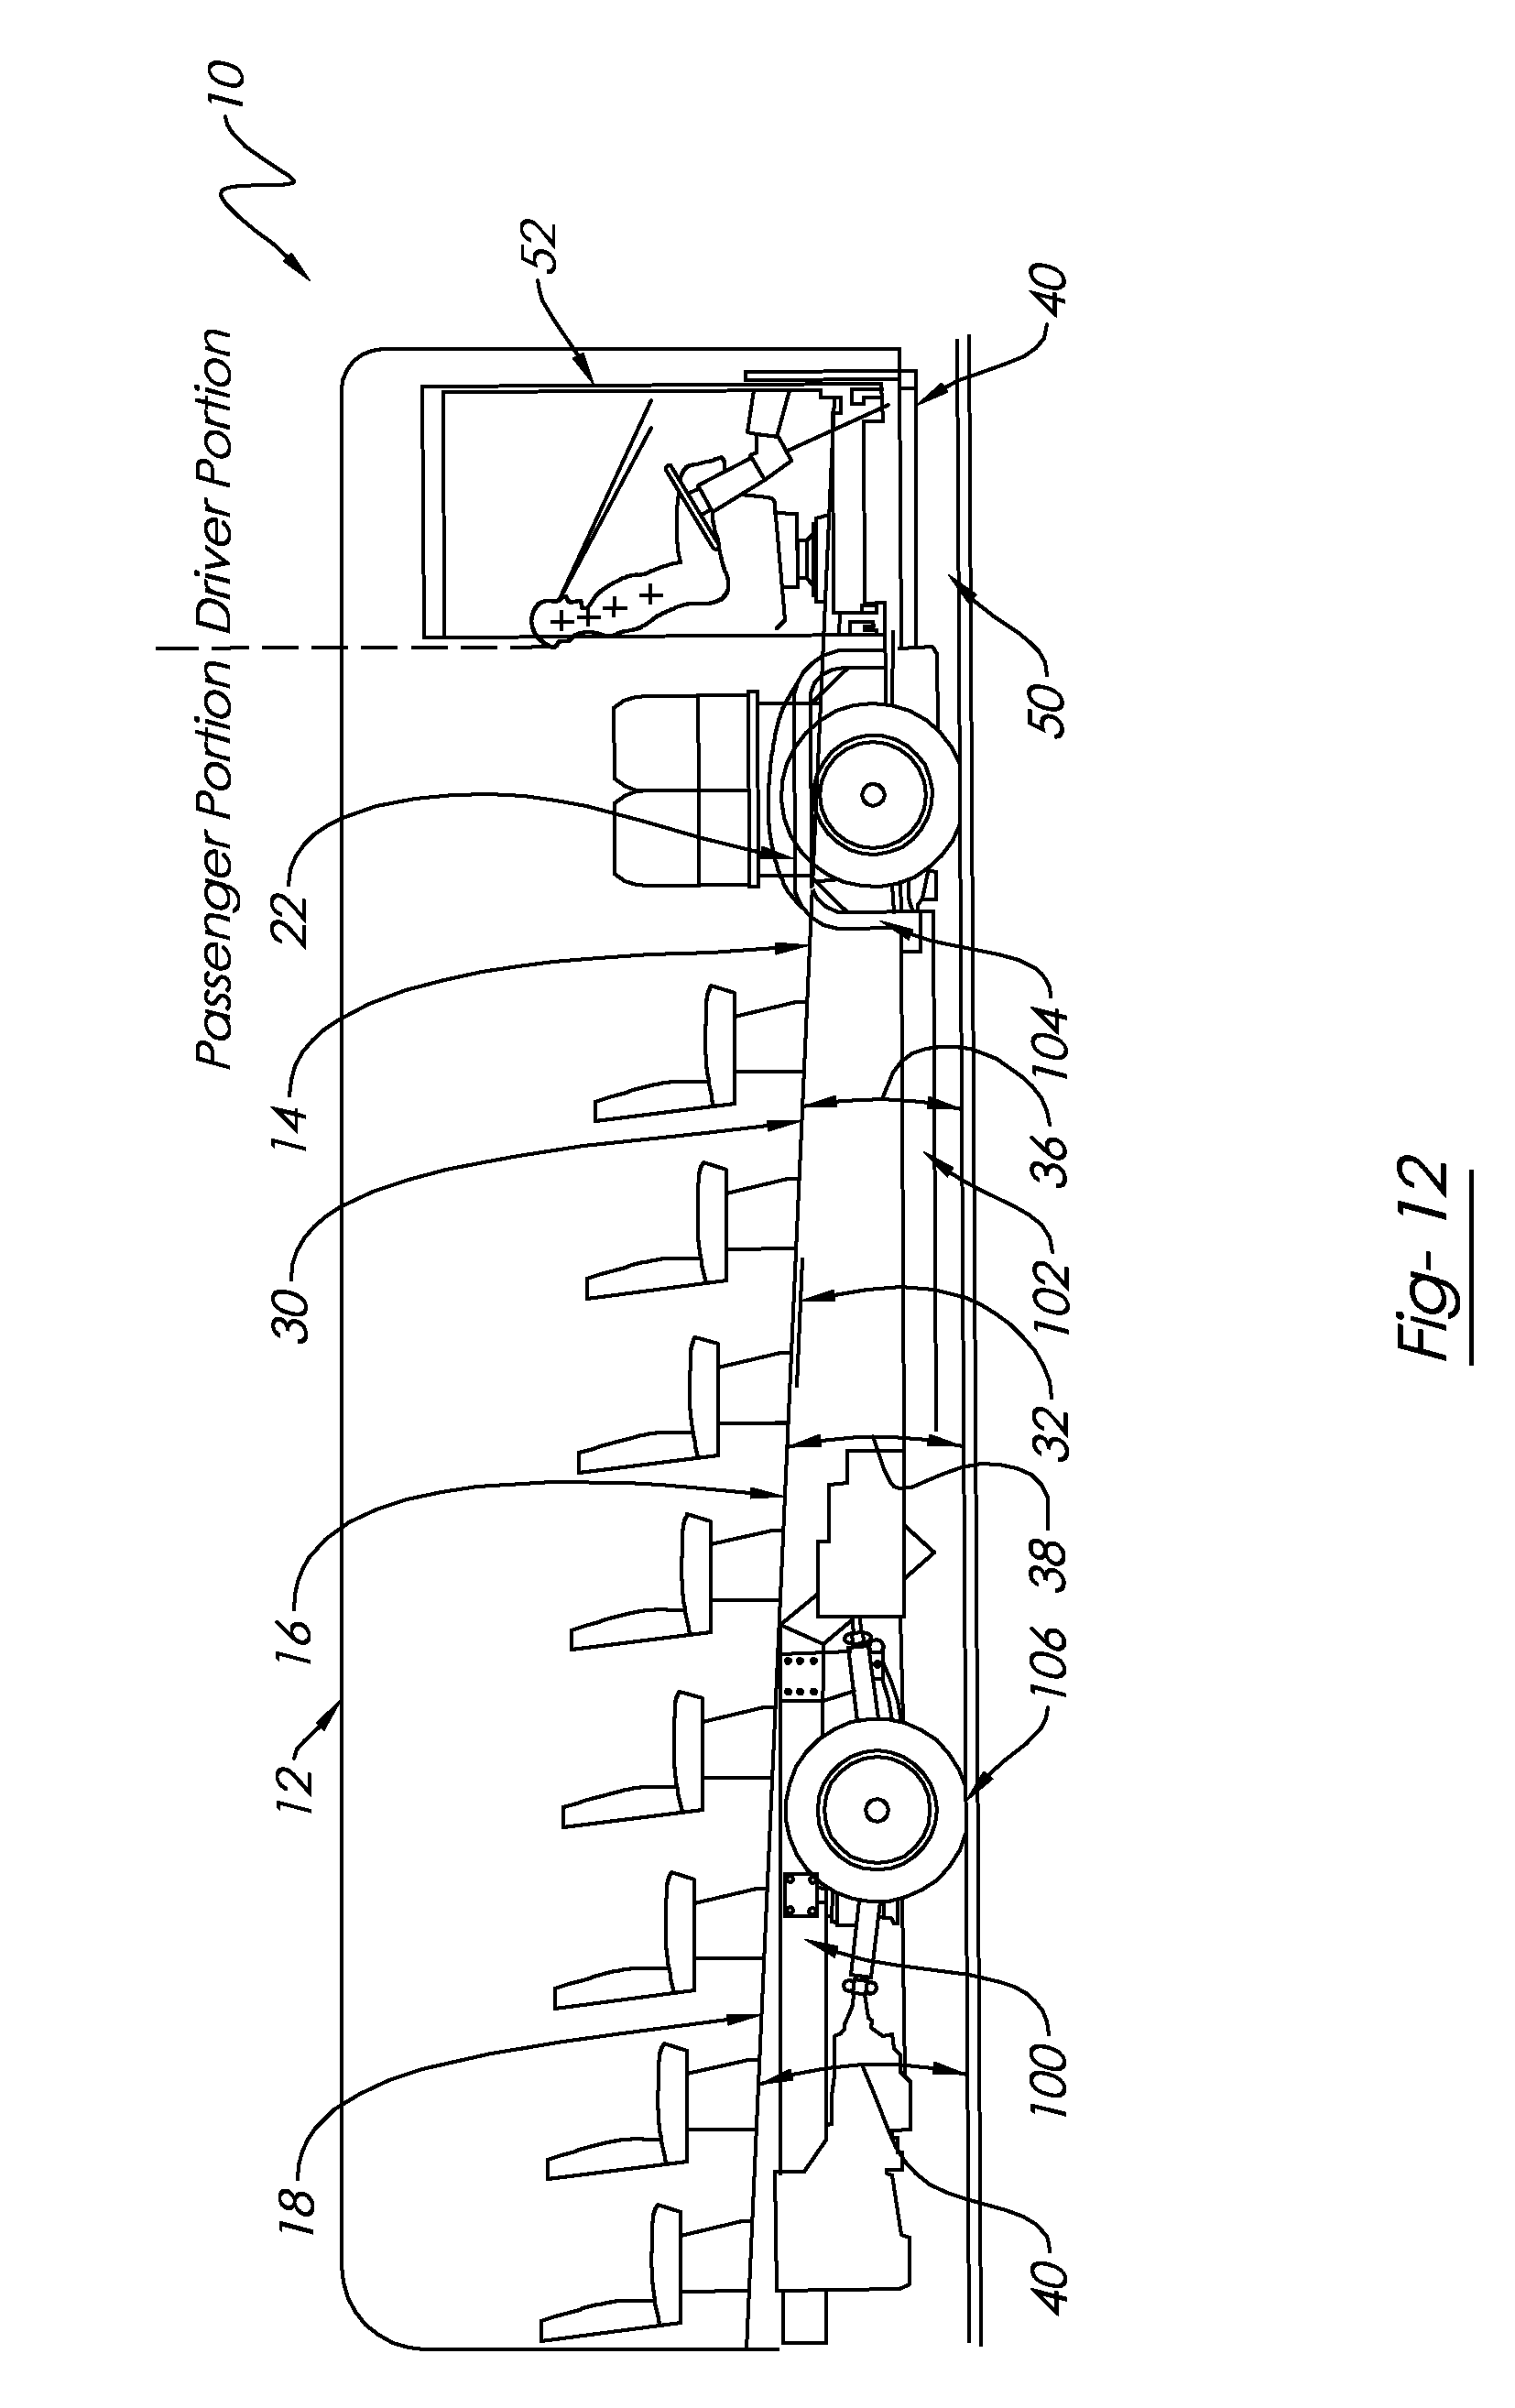 2012 Kenworth T800 Fuse Panel Diagram. Kenworth. Wiring